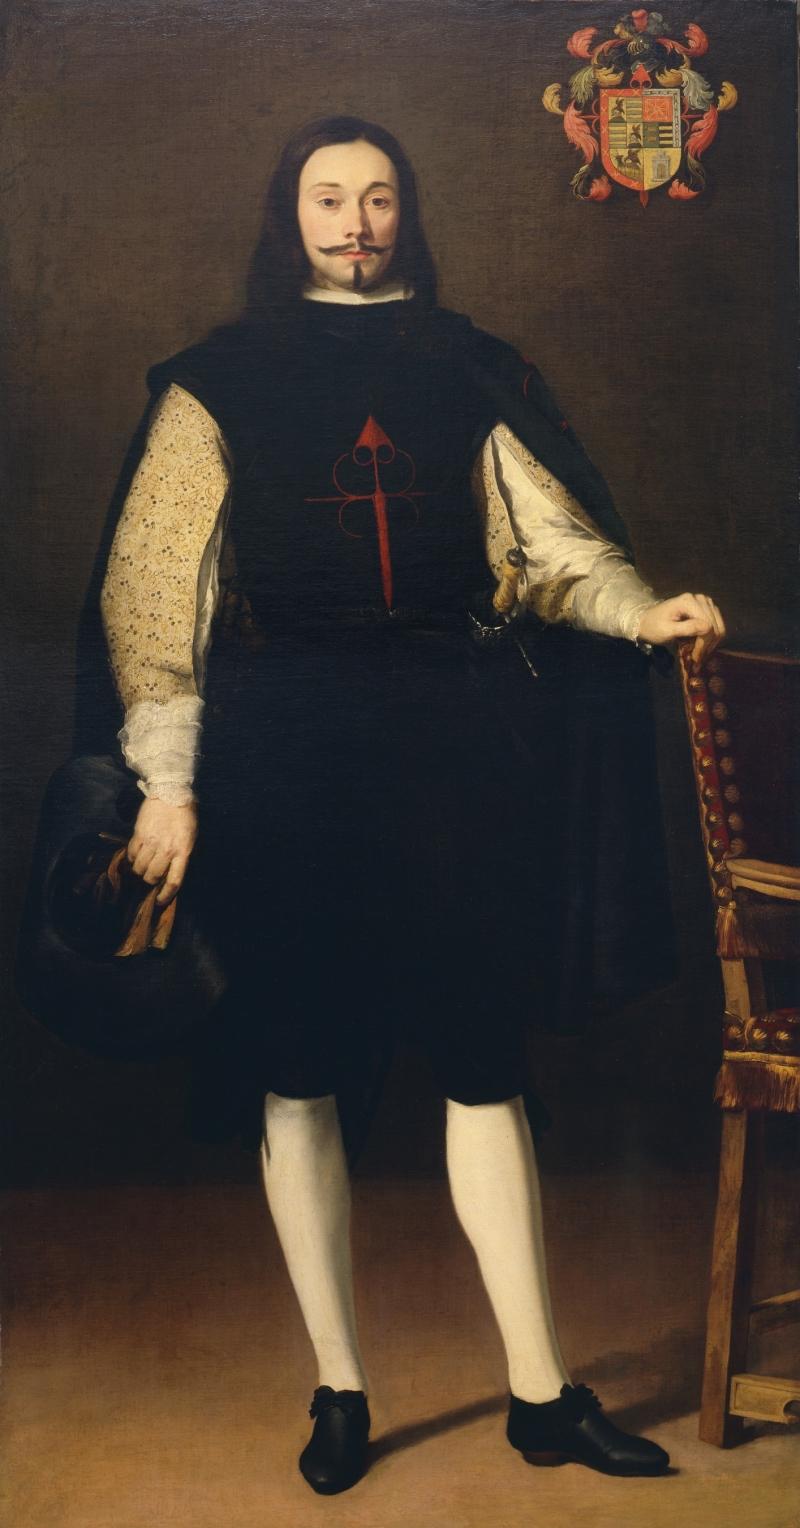 Portrait of Don Diego Félix de Esquivel y Aldama